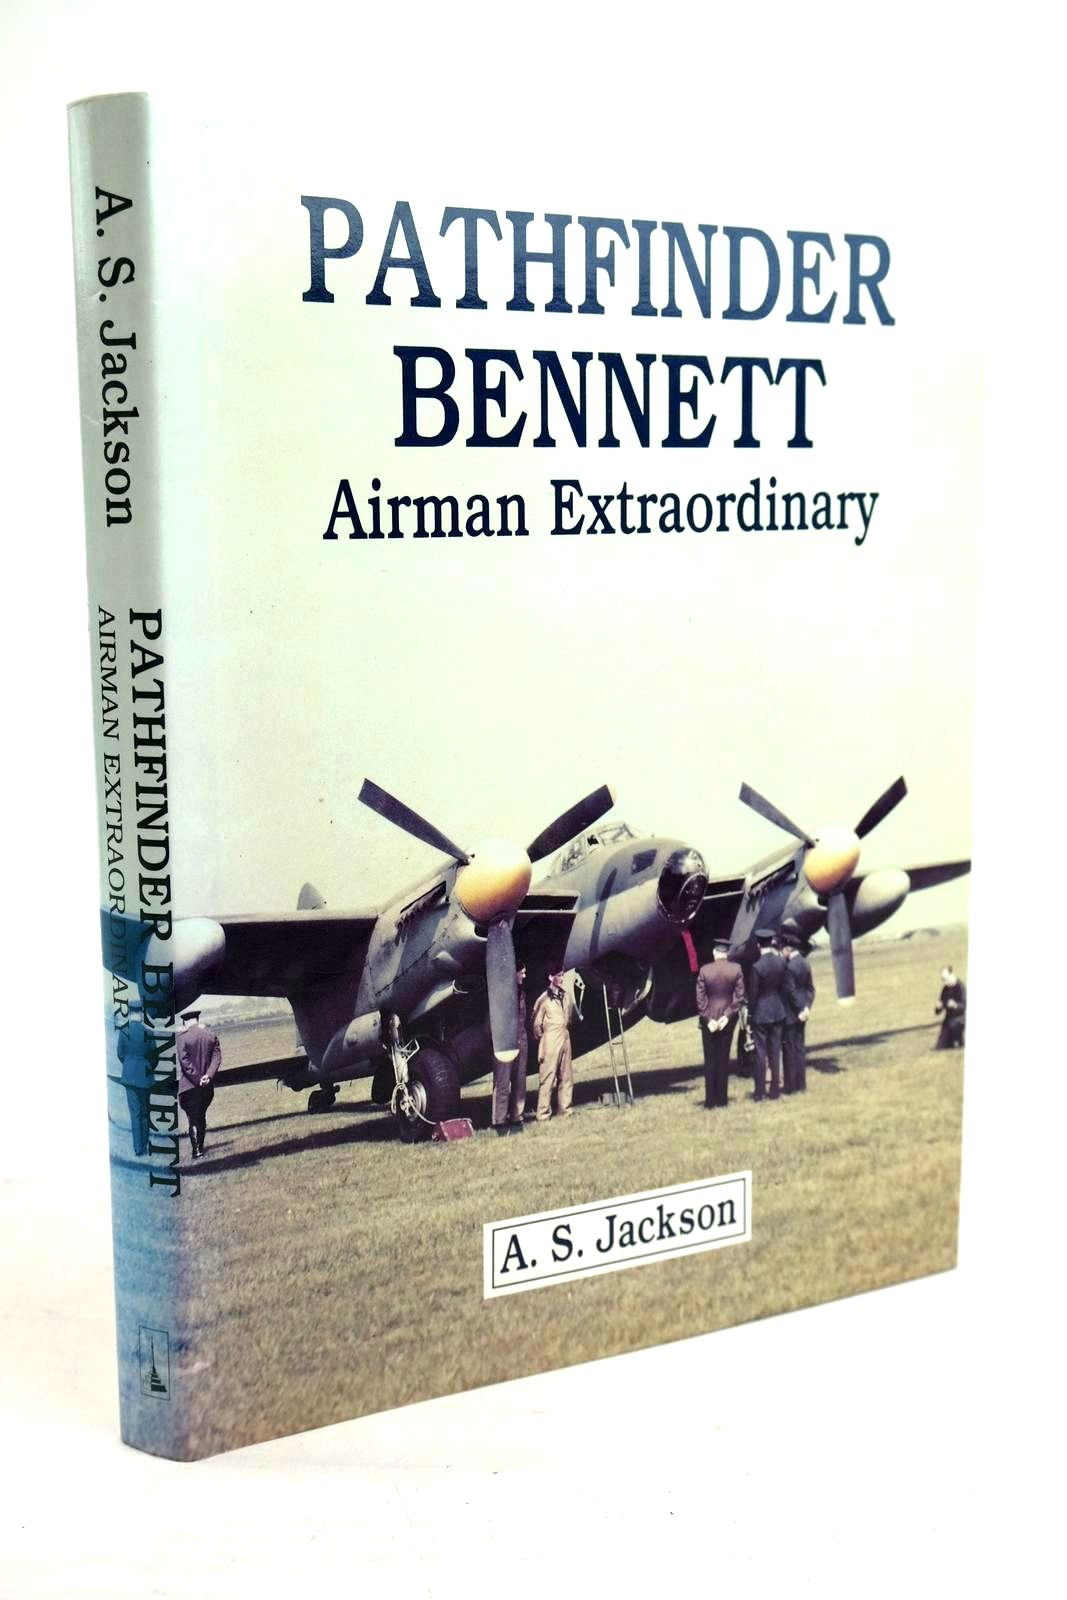 Photo of PATHFINDER BENNETT - AIRMAN EXTRAORDINARY- Stock Number: 1320221